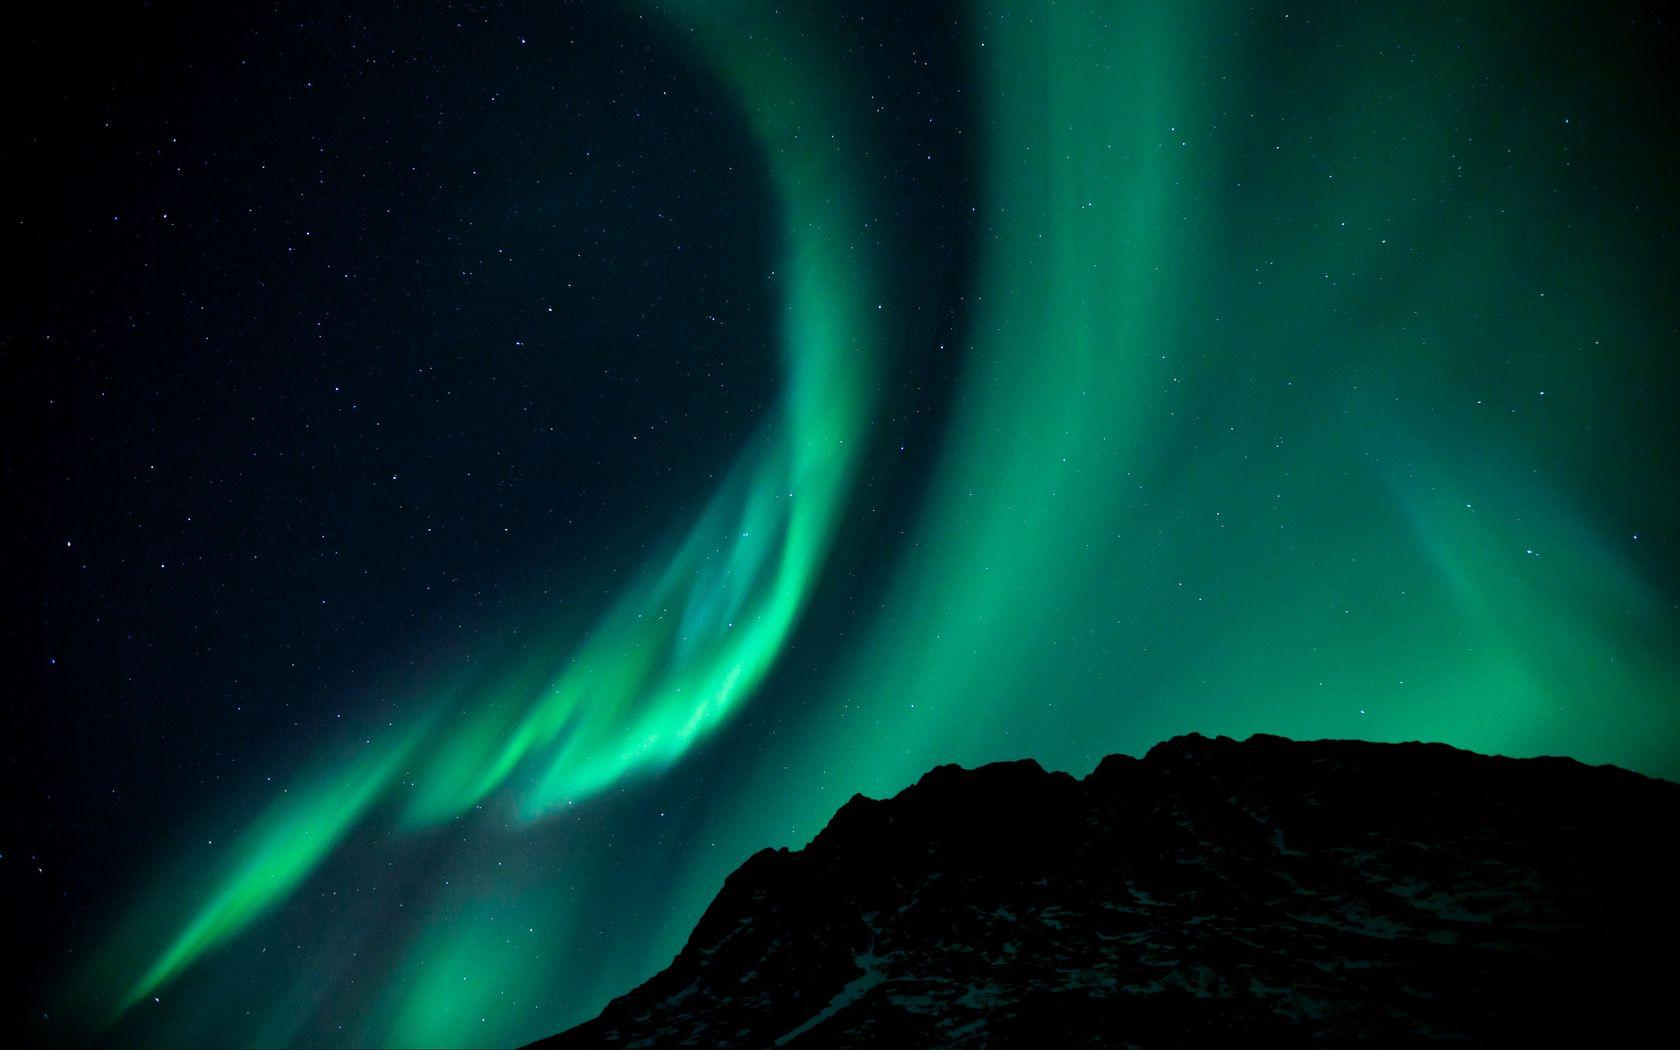 1680x1050 Wallpaper northern lights, night, night sky, phenomenon